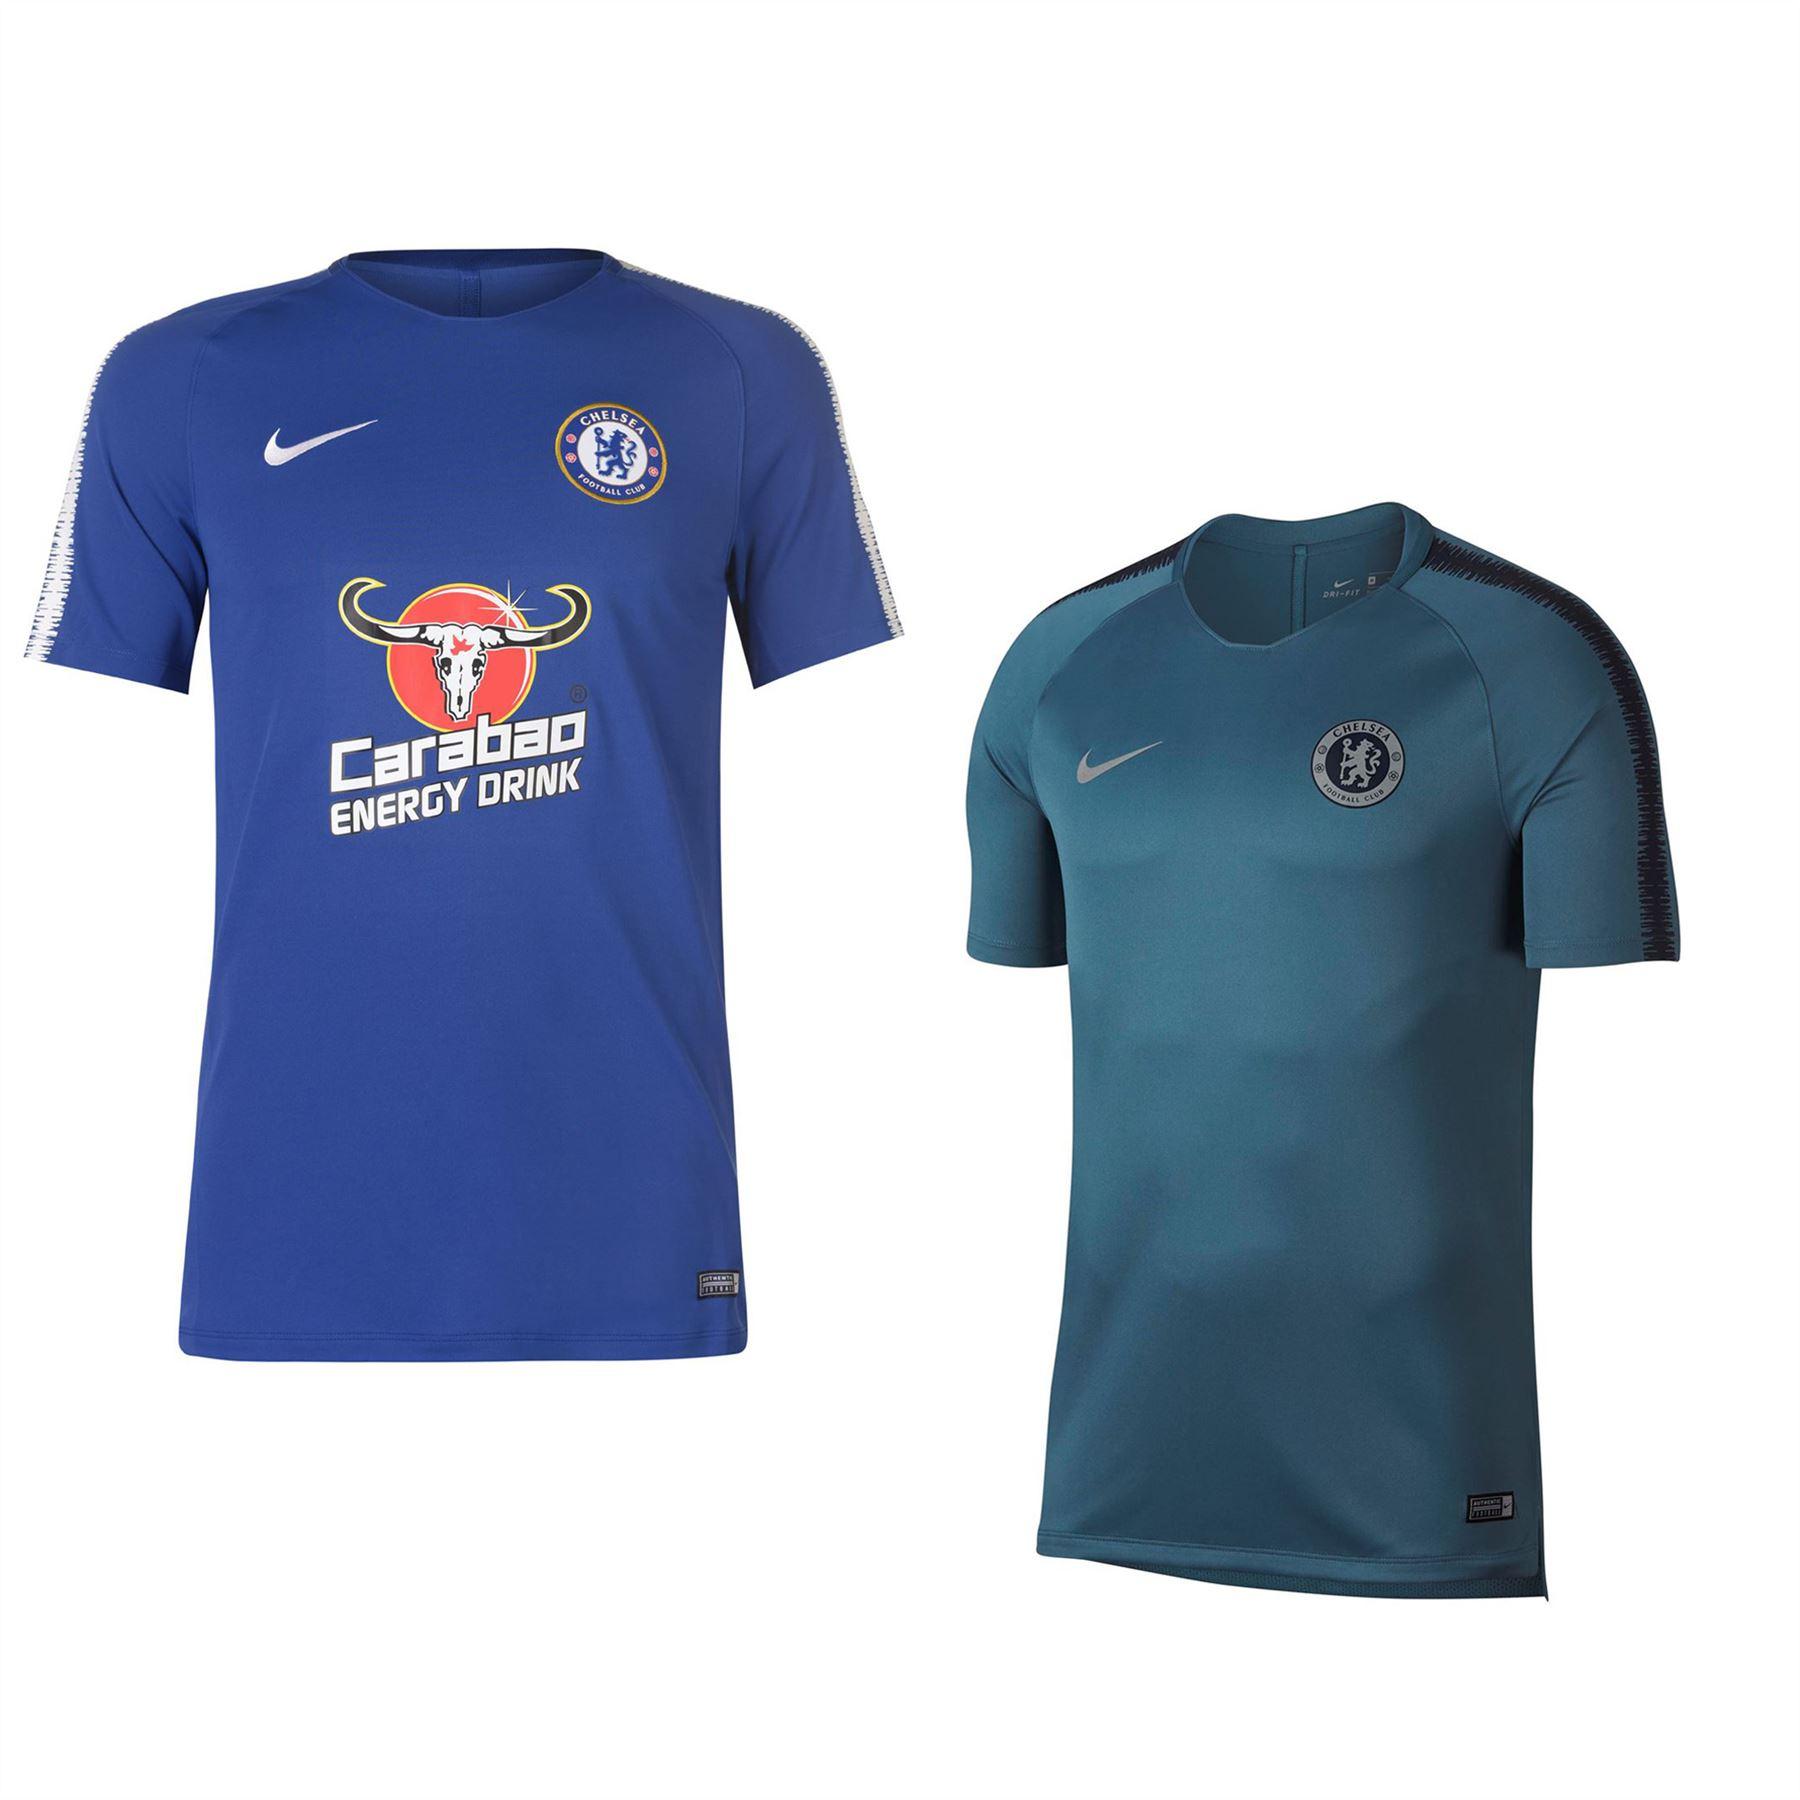 64058d10d ... Nike Chelsea Squad T-Shirt 2018 2019 Mens Football Soccer Fan Top Tee  Shirt ...